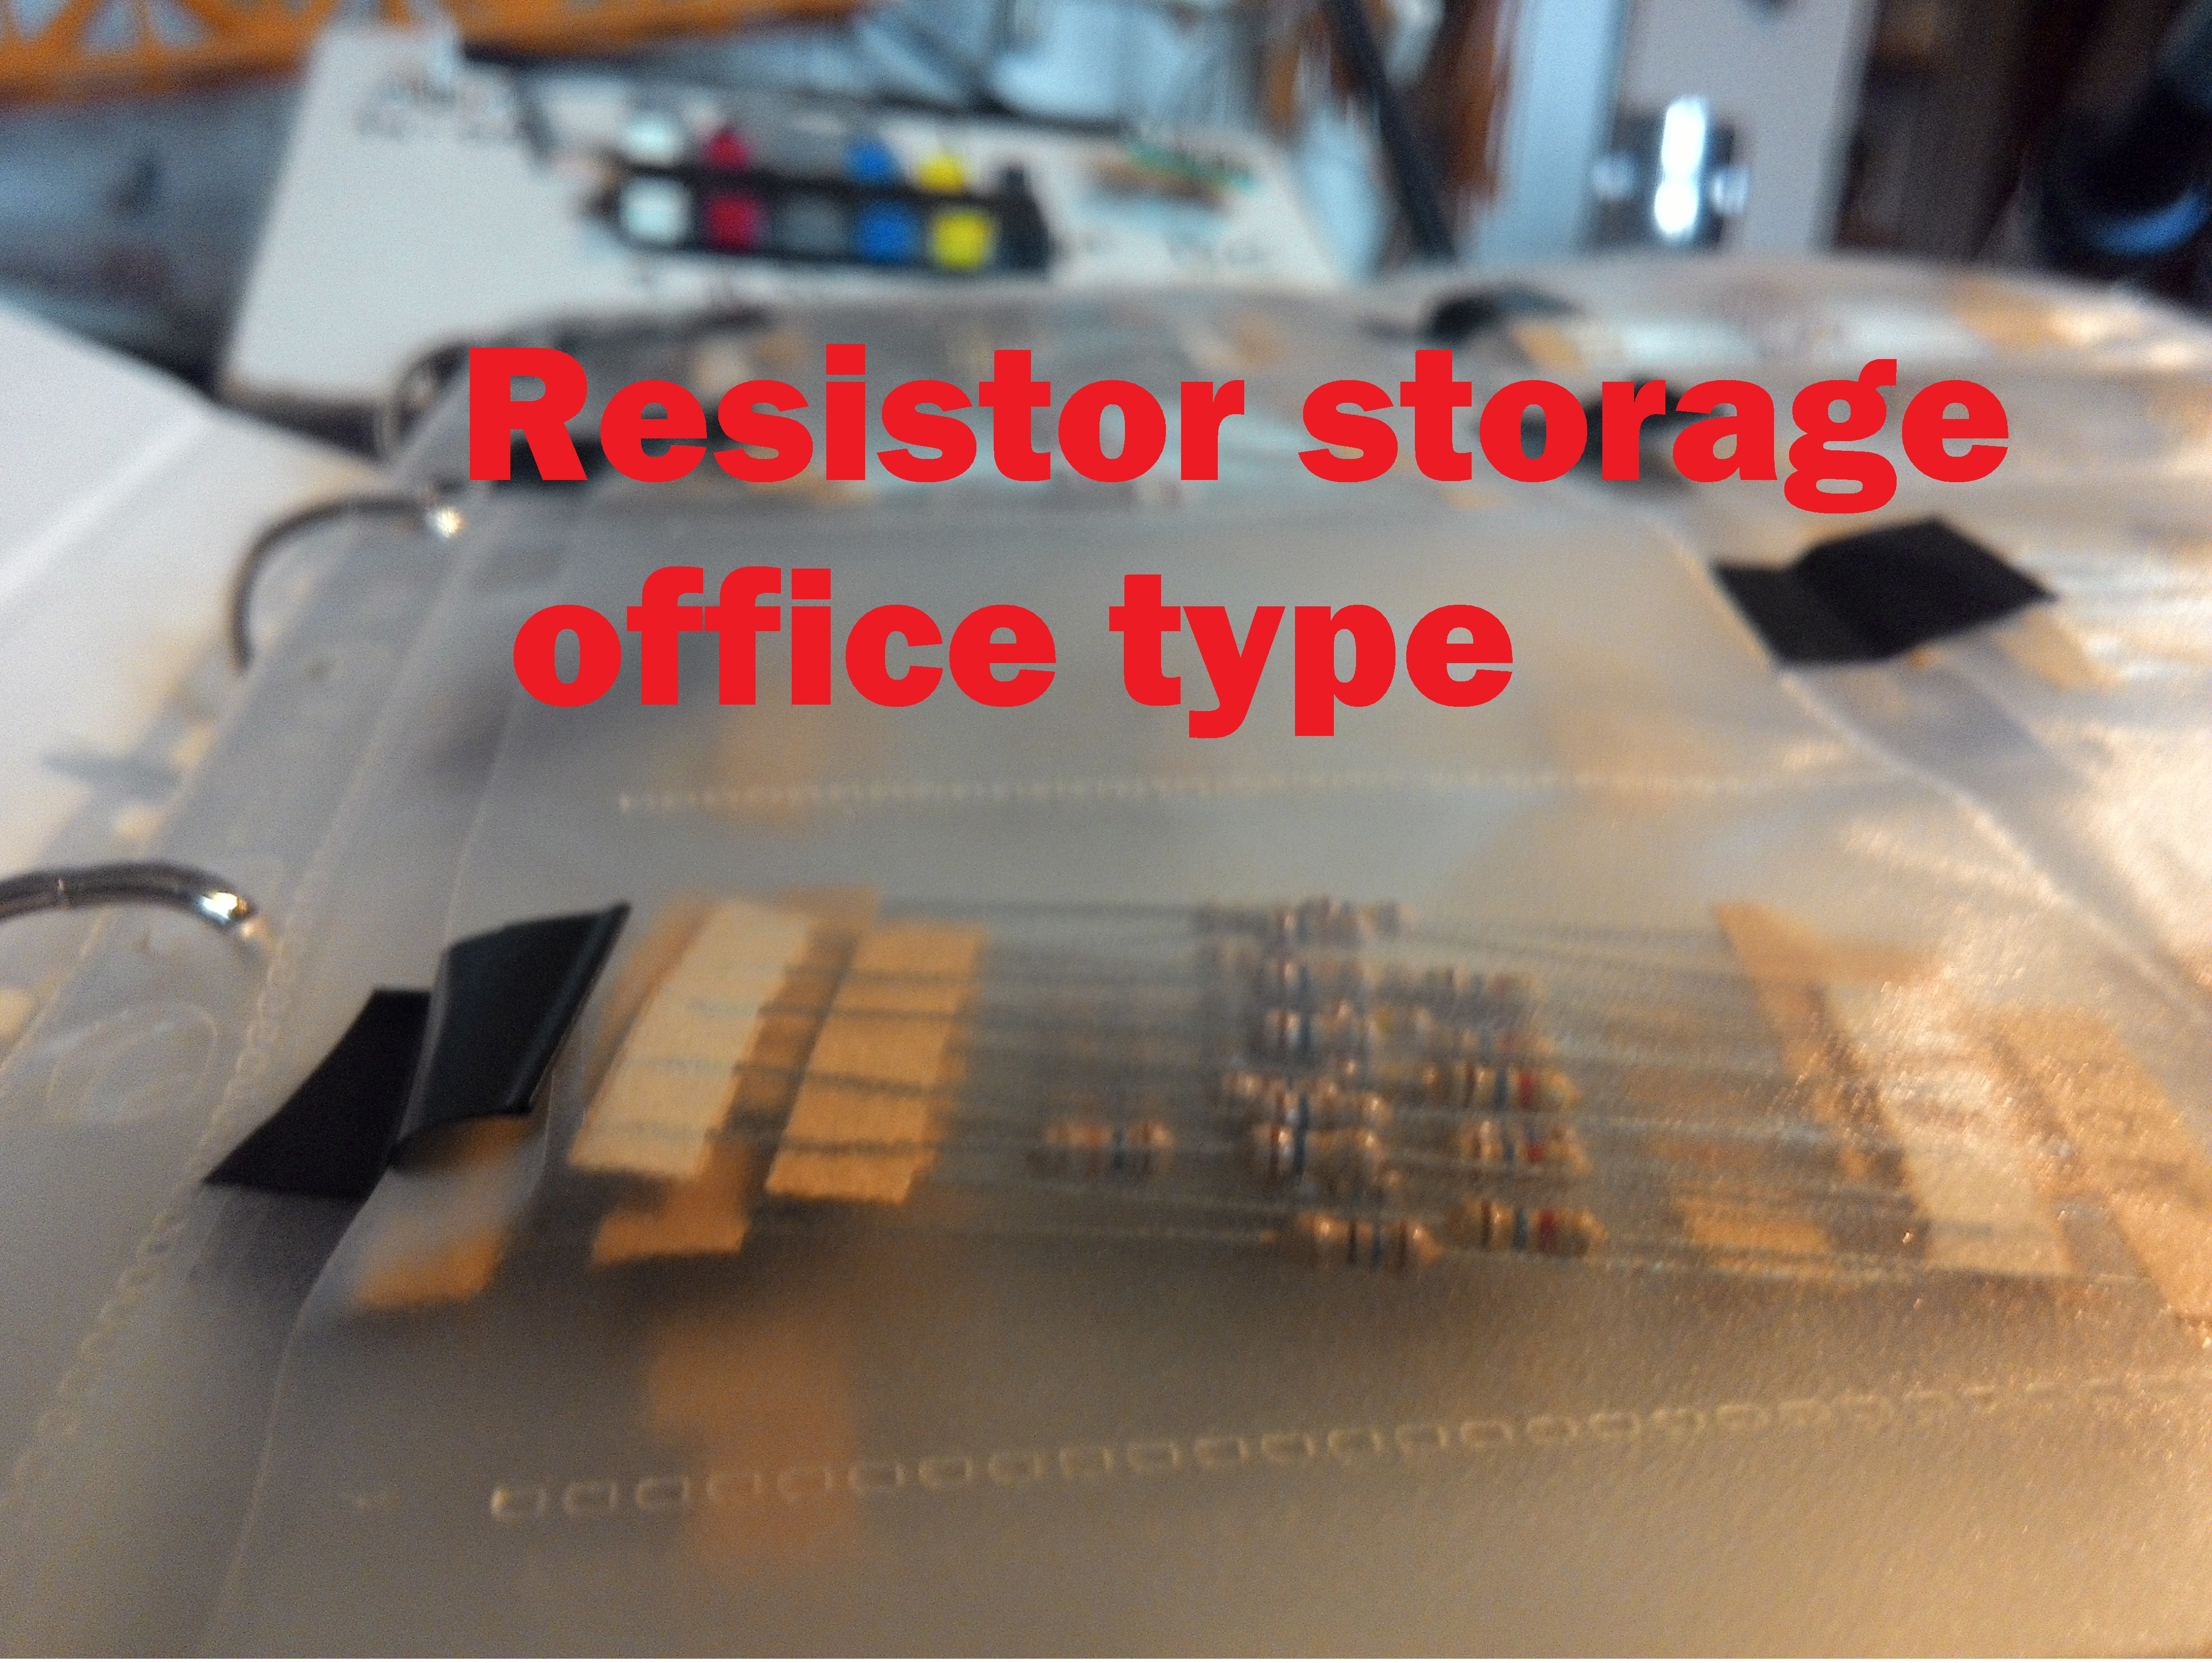 Resistor storage - office type